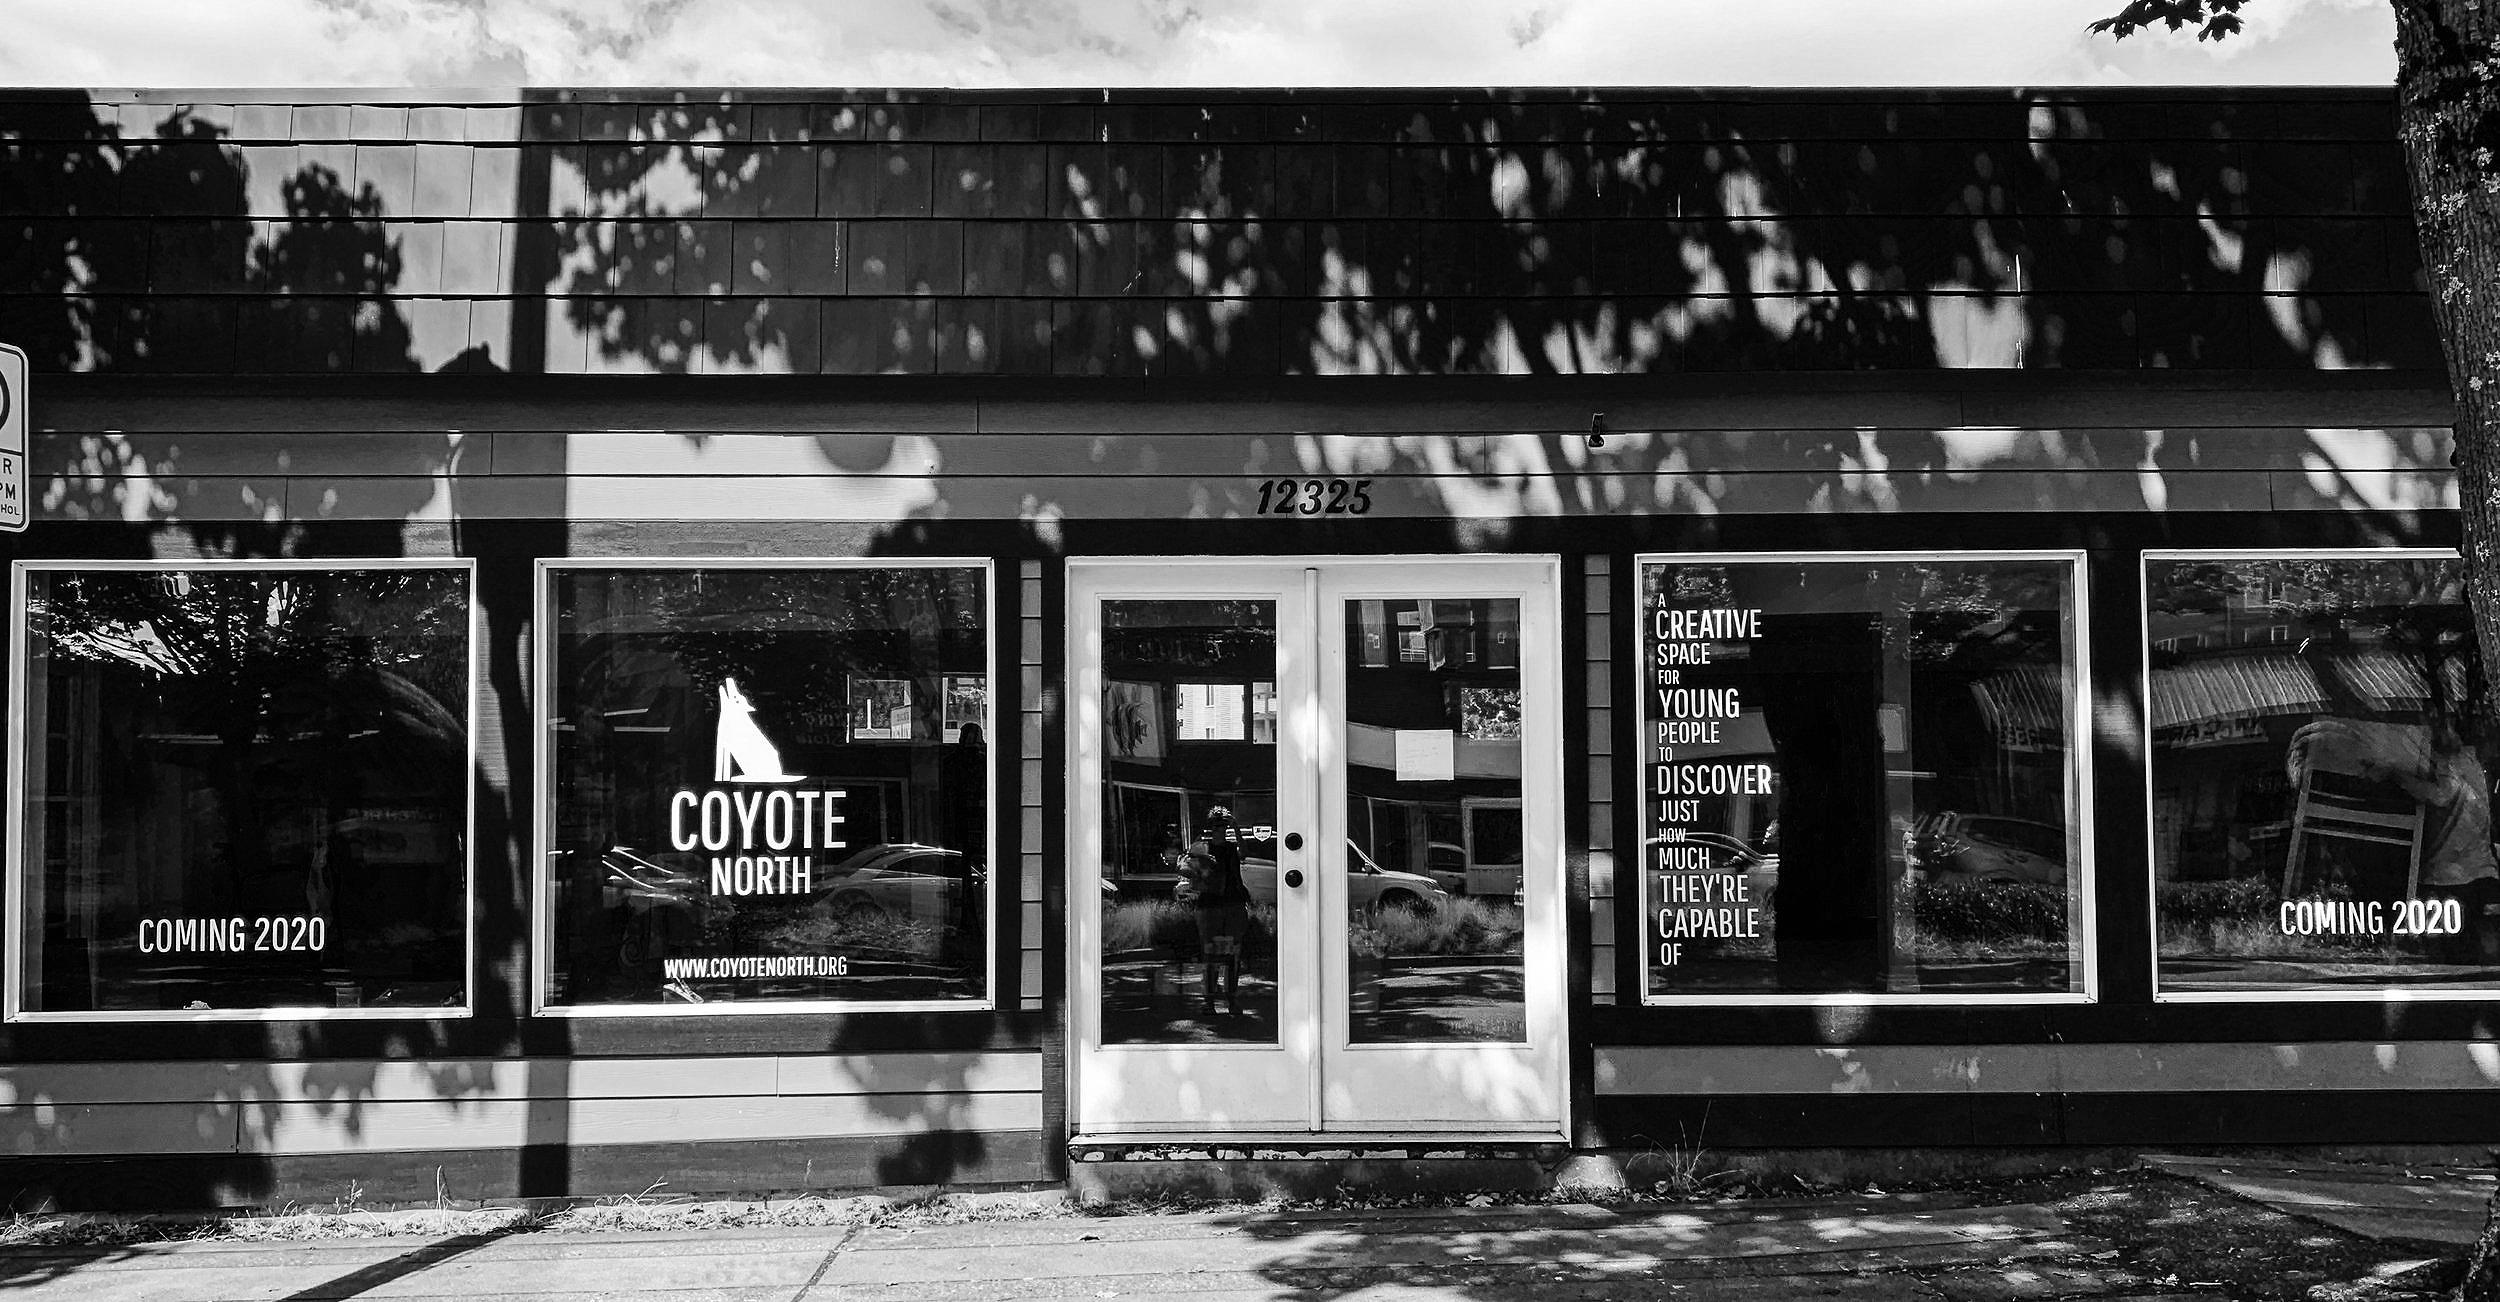 Coyote+North+Exterior+Branding.jpg